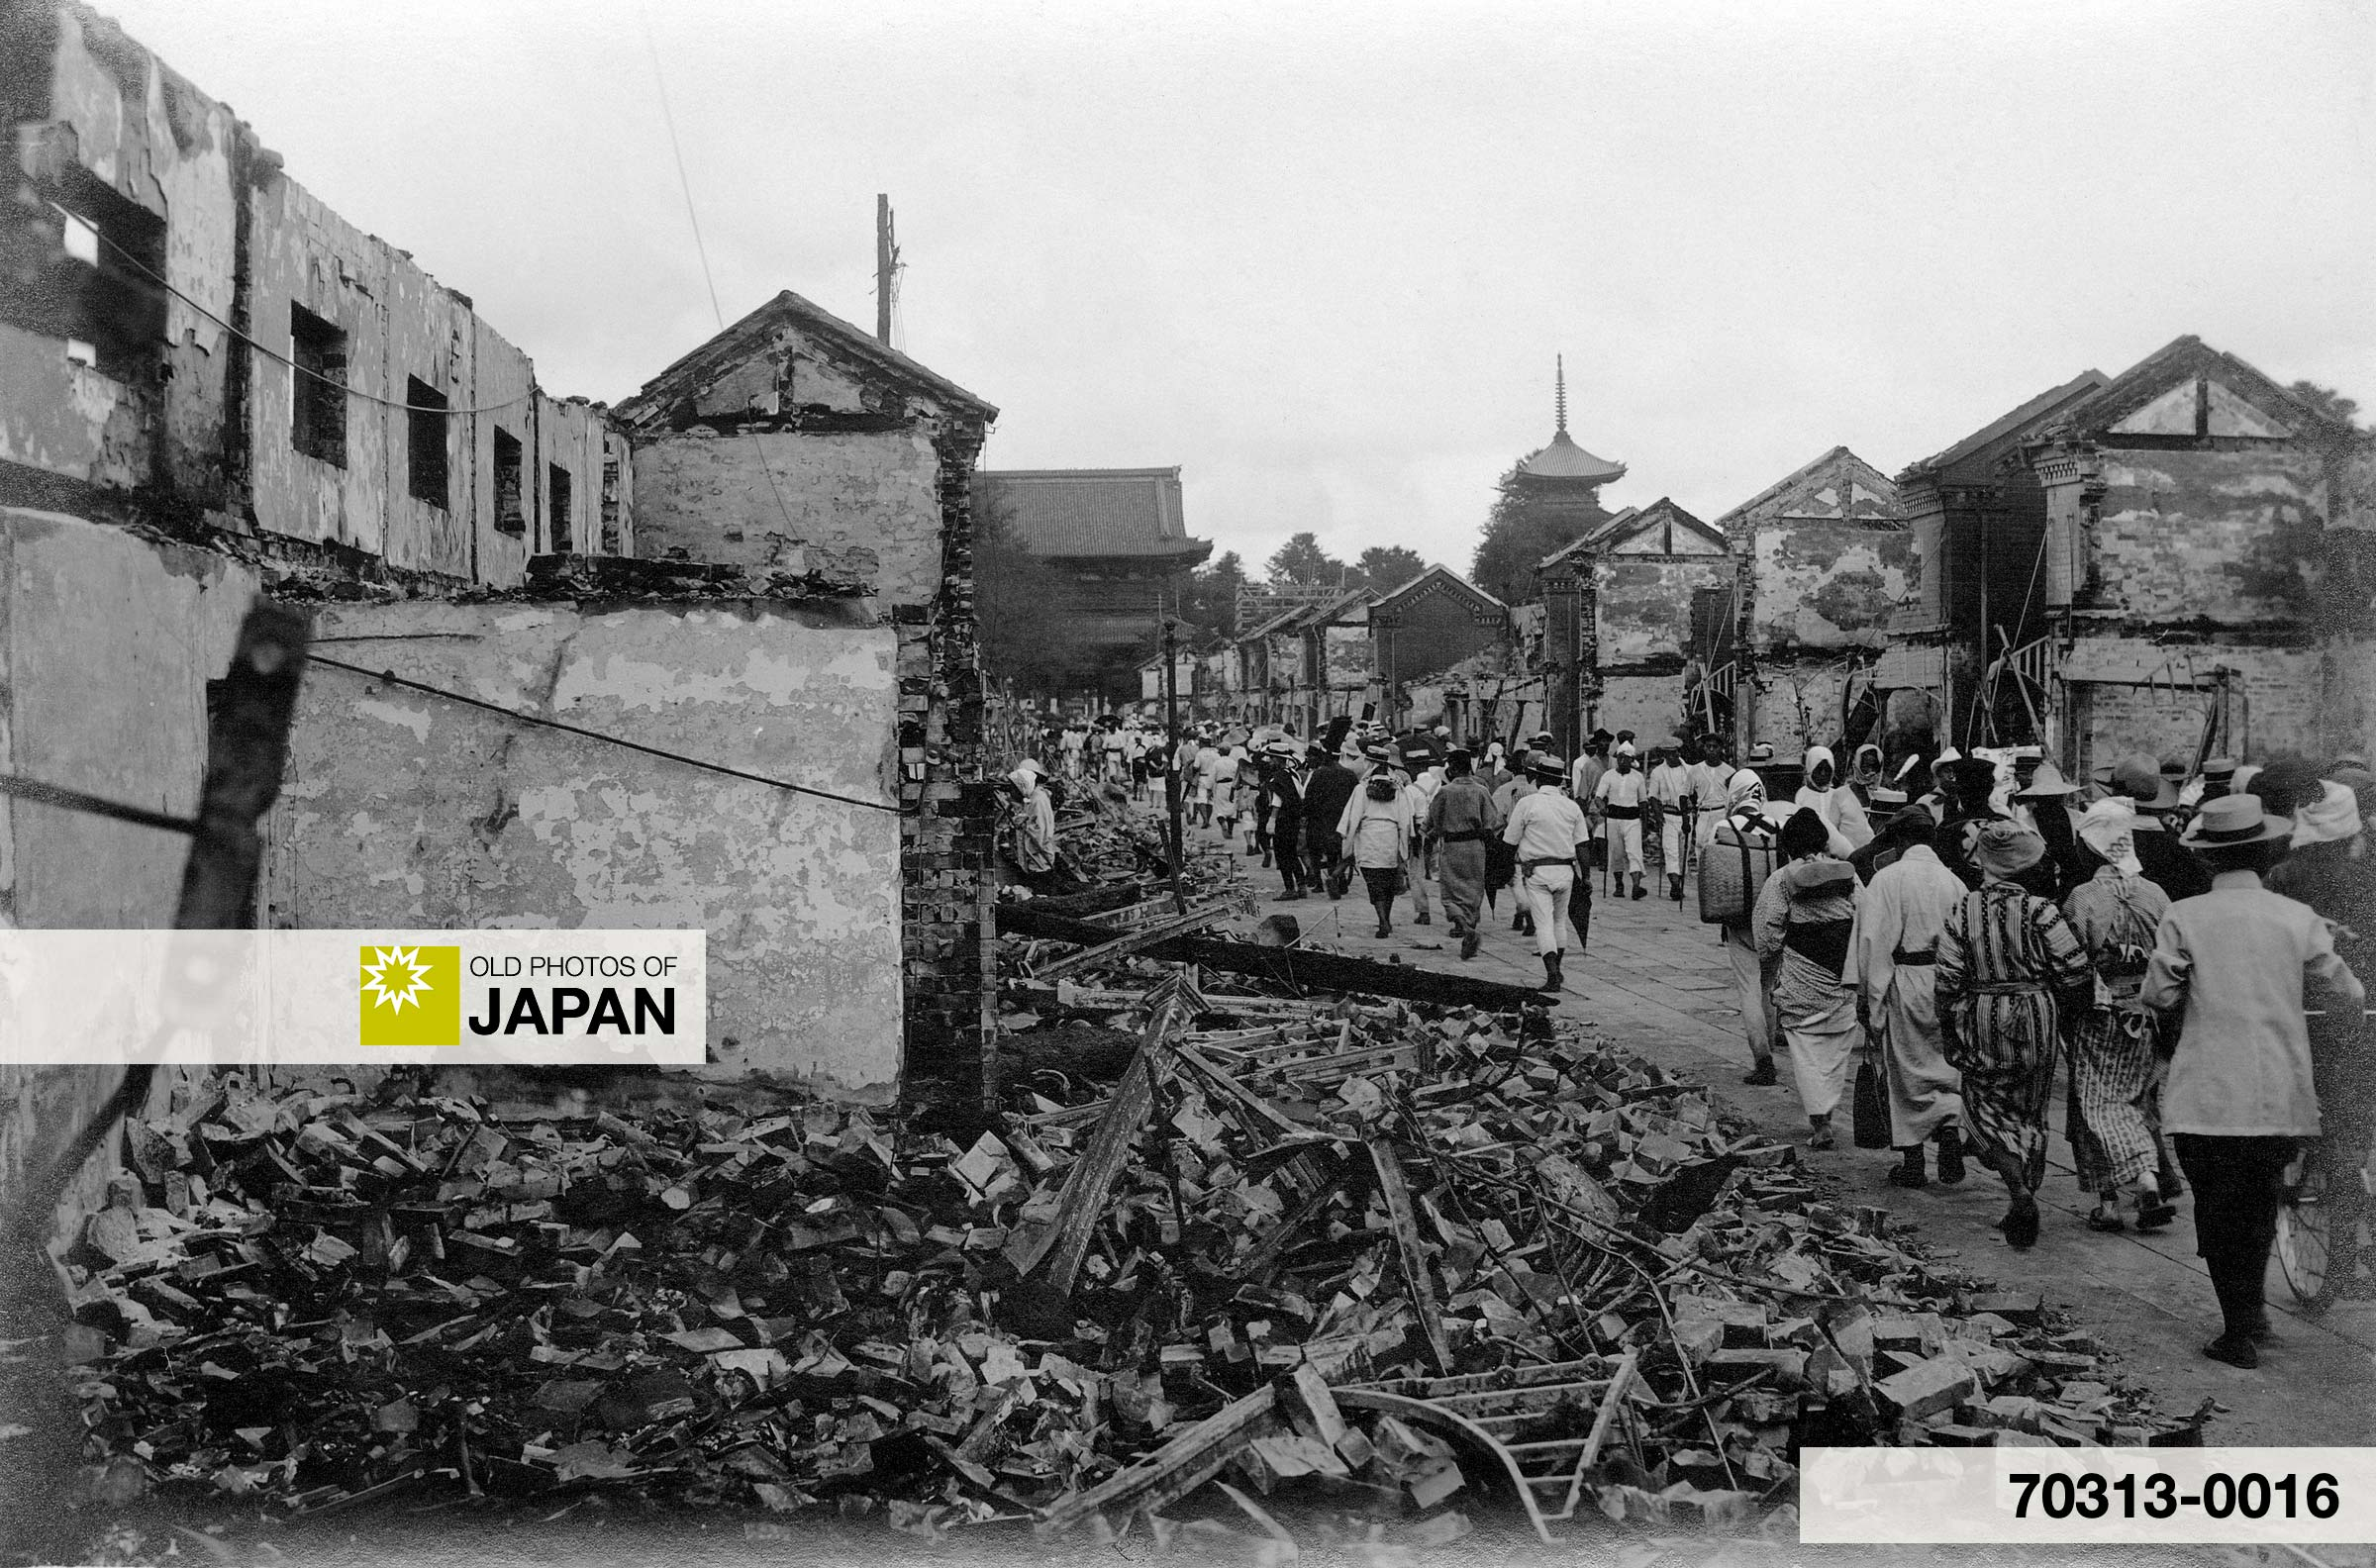 Asakusa Nakamise after the Great Kanto Earthquake